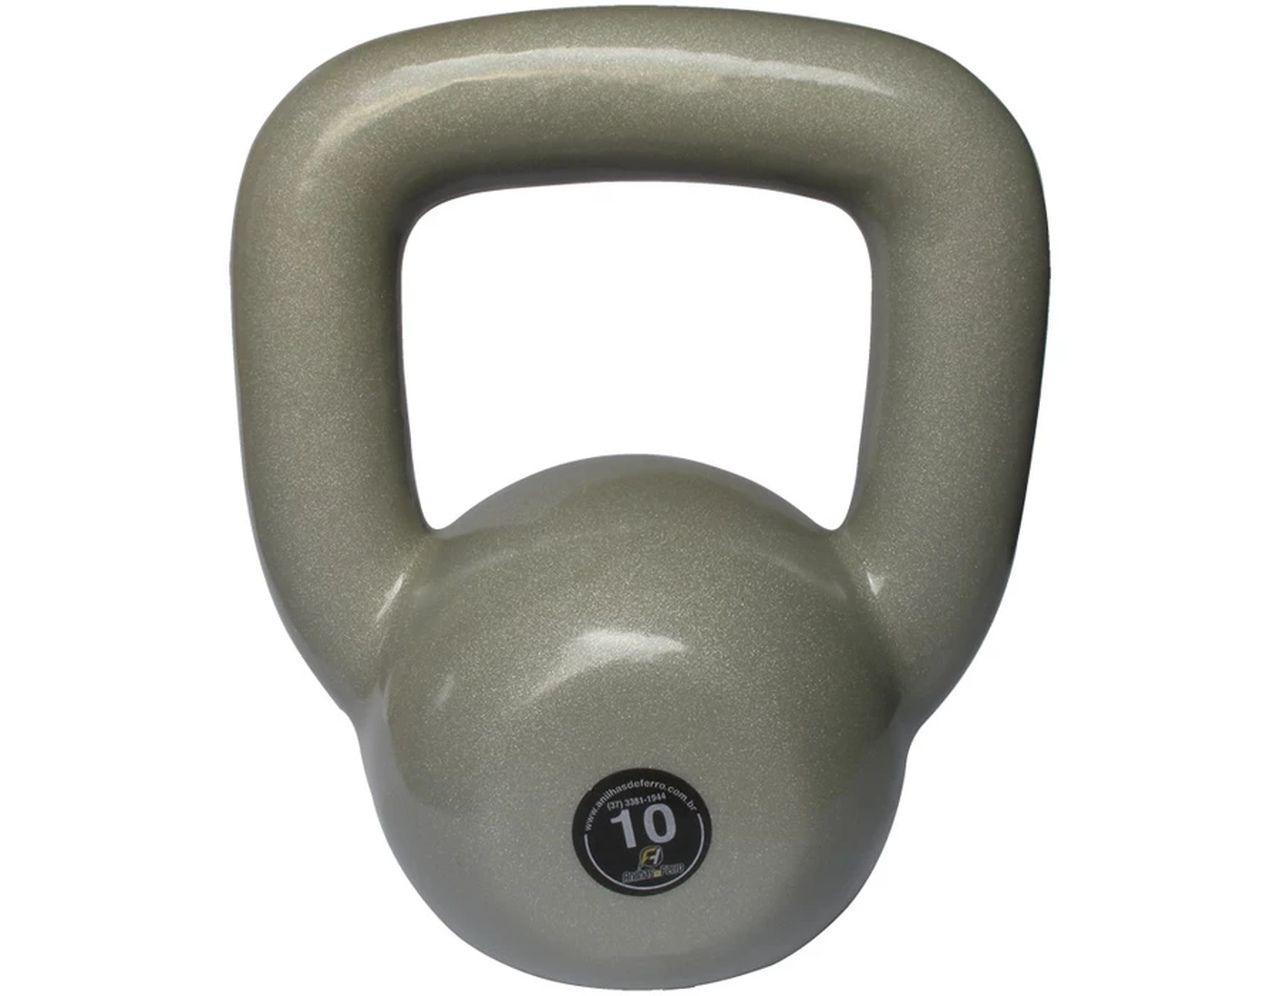 Kettlebell Emborrachado Treinamento Funcional Fitness 10,0kg